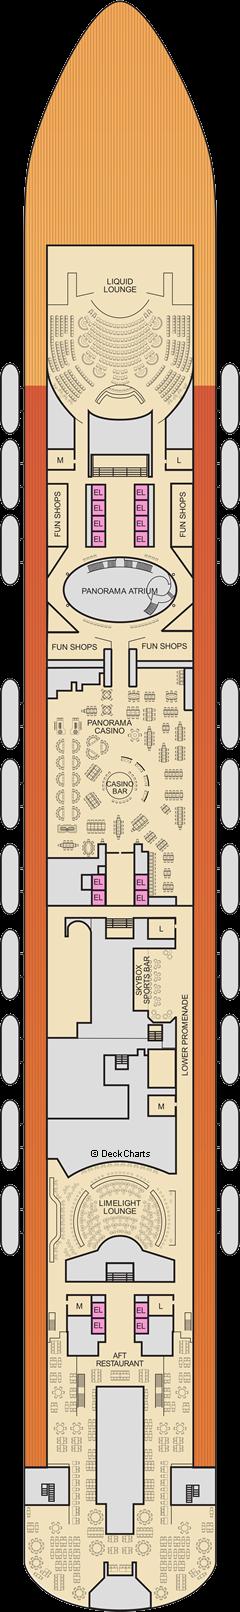 Carnival Panorama : Mezzanine Deck